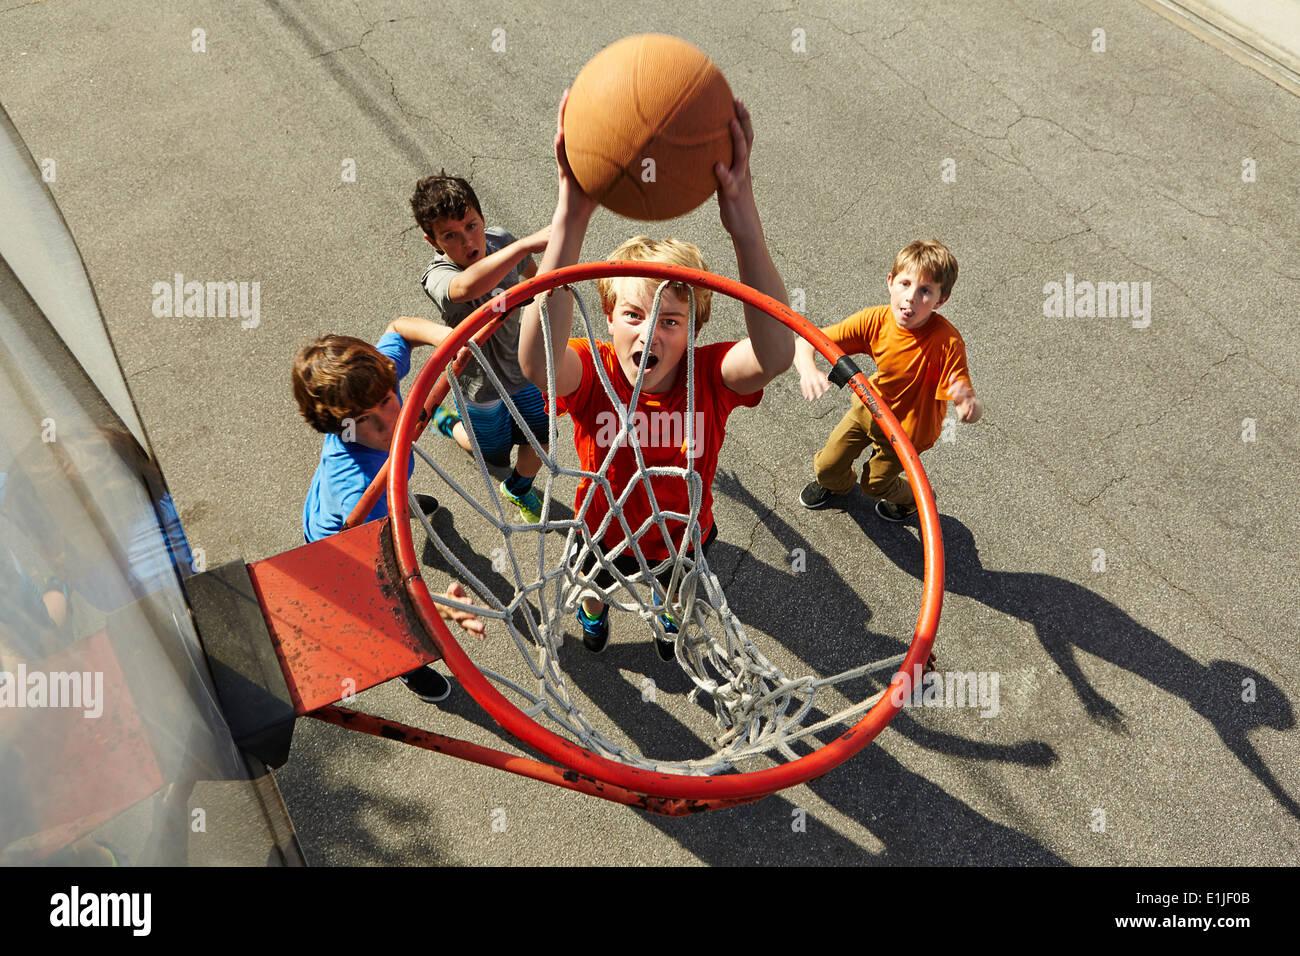 Garçons jouant au basket-ball, high angle Photo Stock